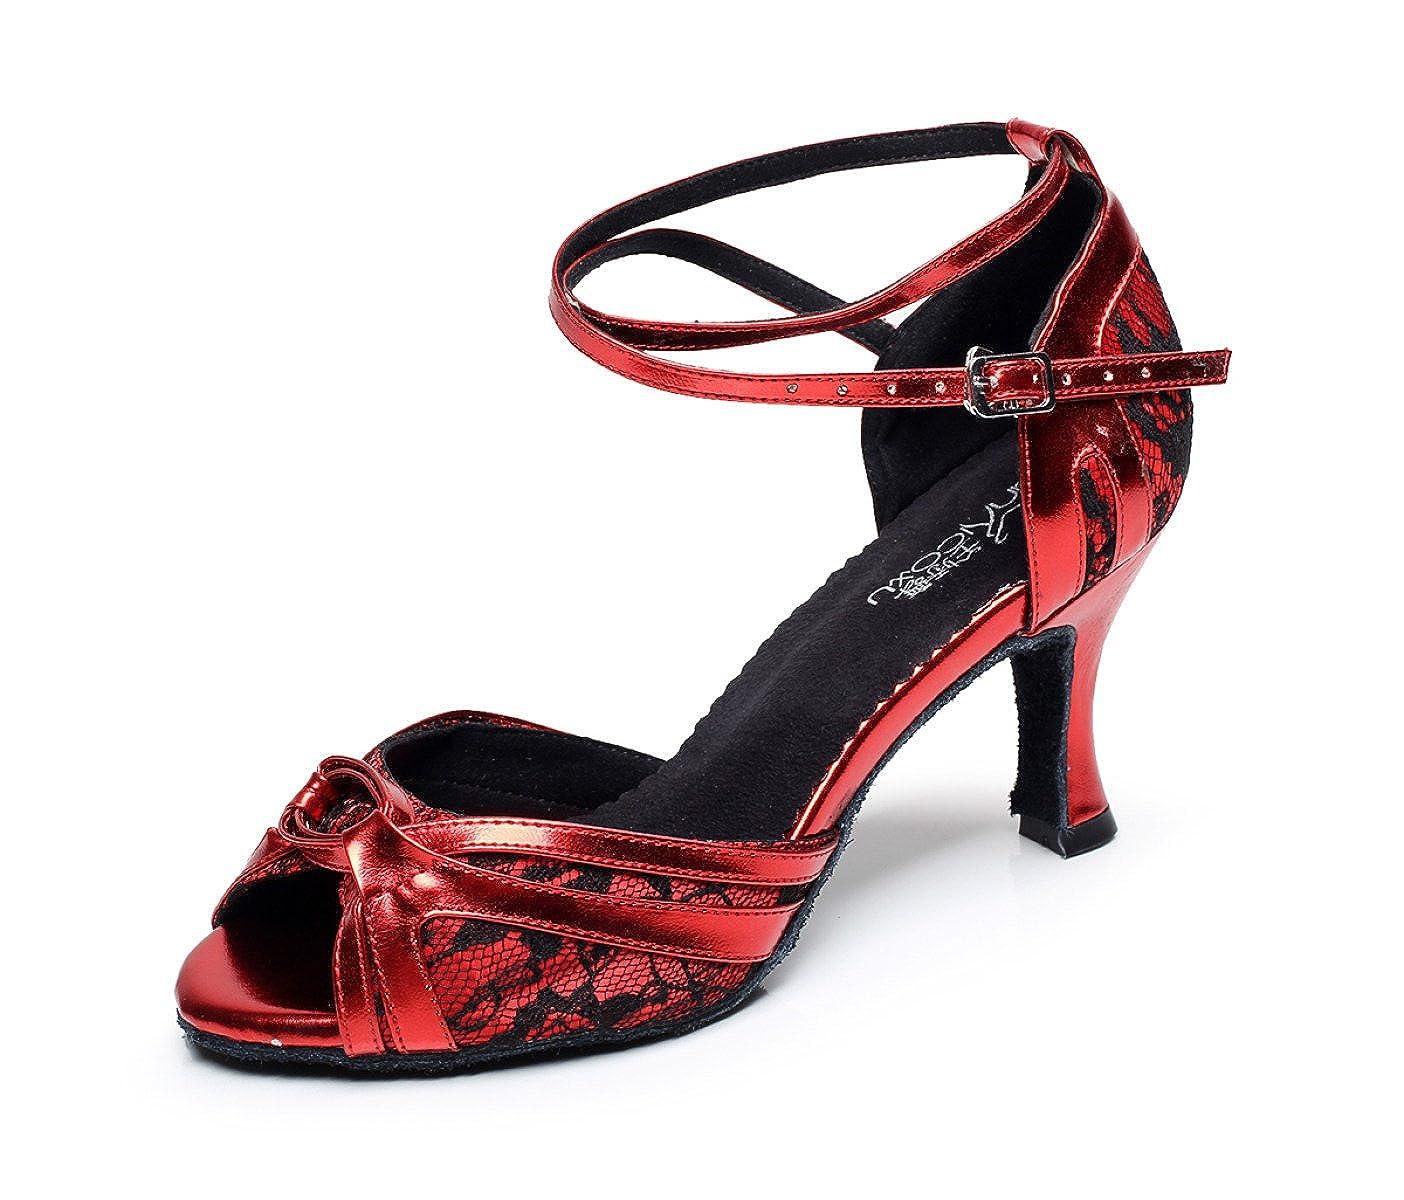 JSHOE Chaussures De Danse Pour 19952 Talons Femme Latin Salsa/Tango JSHOE/Thé/Samba/Moderne/Jazz Chaussures Sandales Talons Hauts,Red-heeled7.5cm-UK7.5/EU42/Our43 - 69a9b08 - boatplans.space